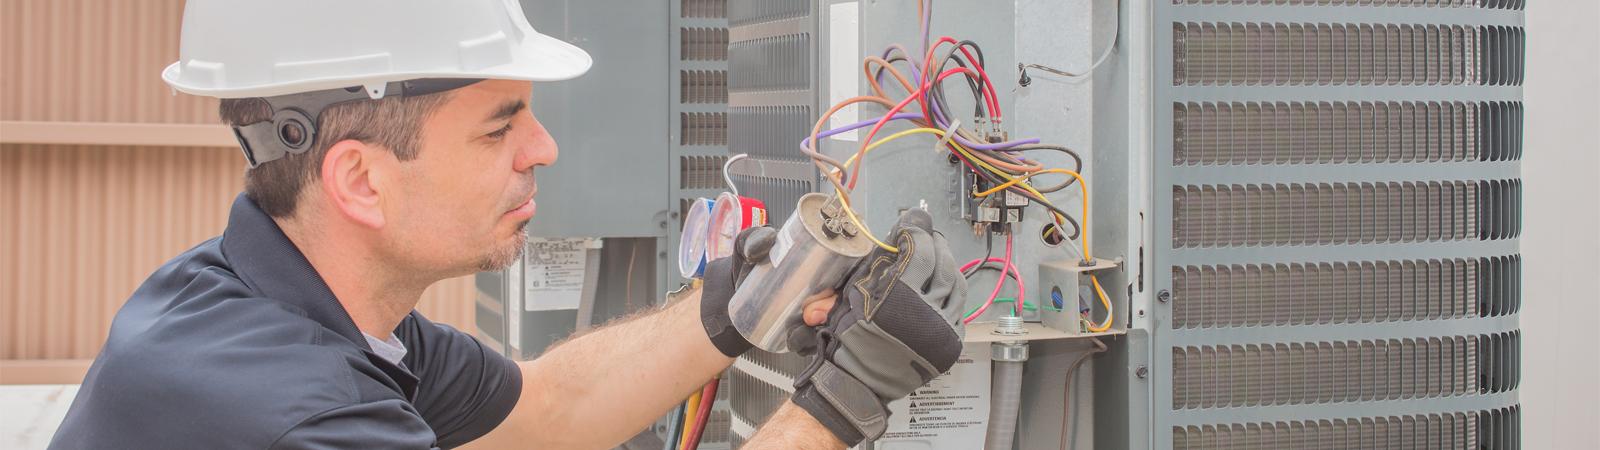 a technician performing commercial AC repair